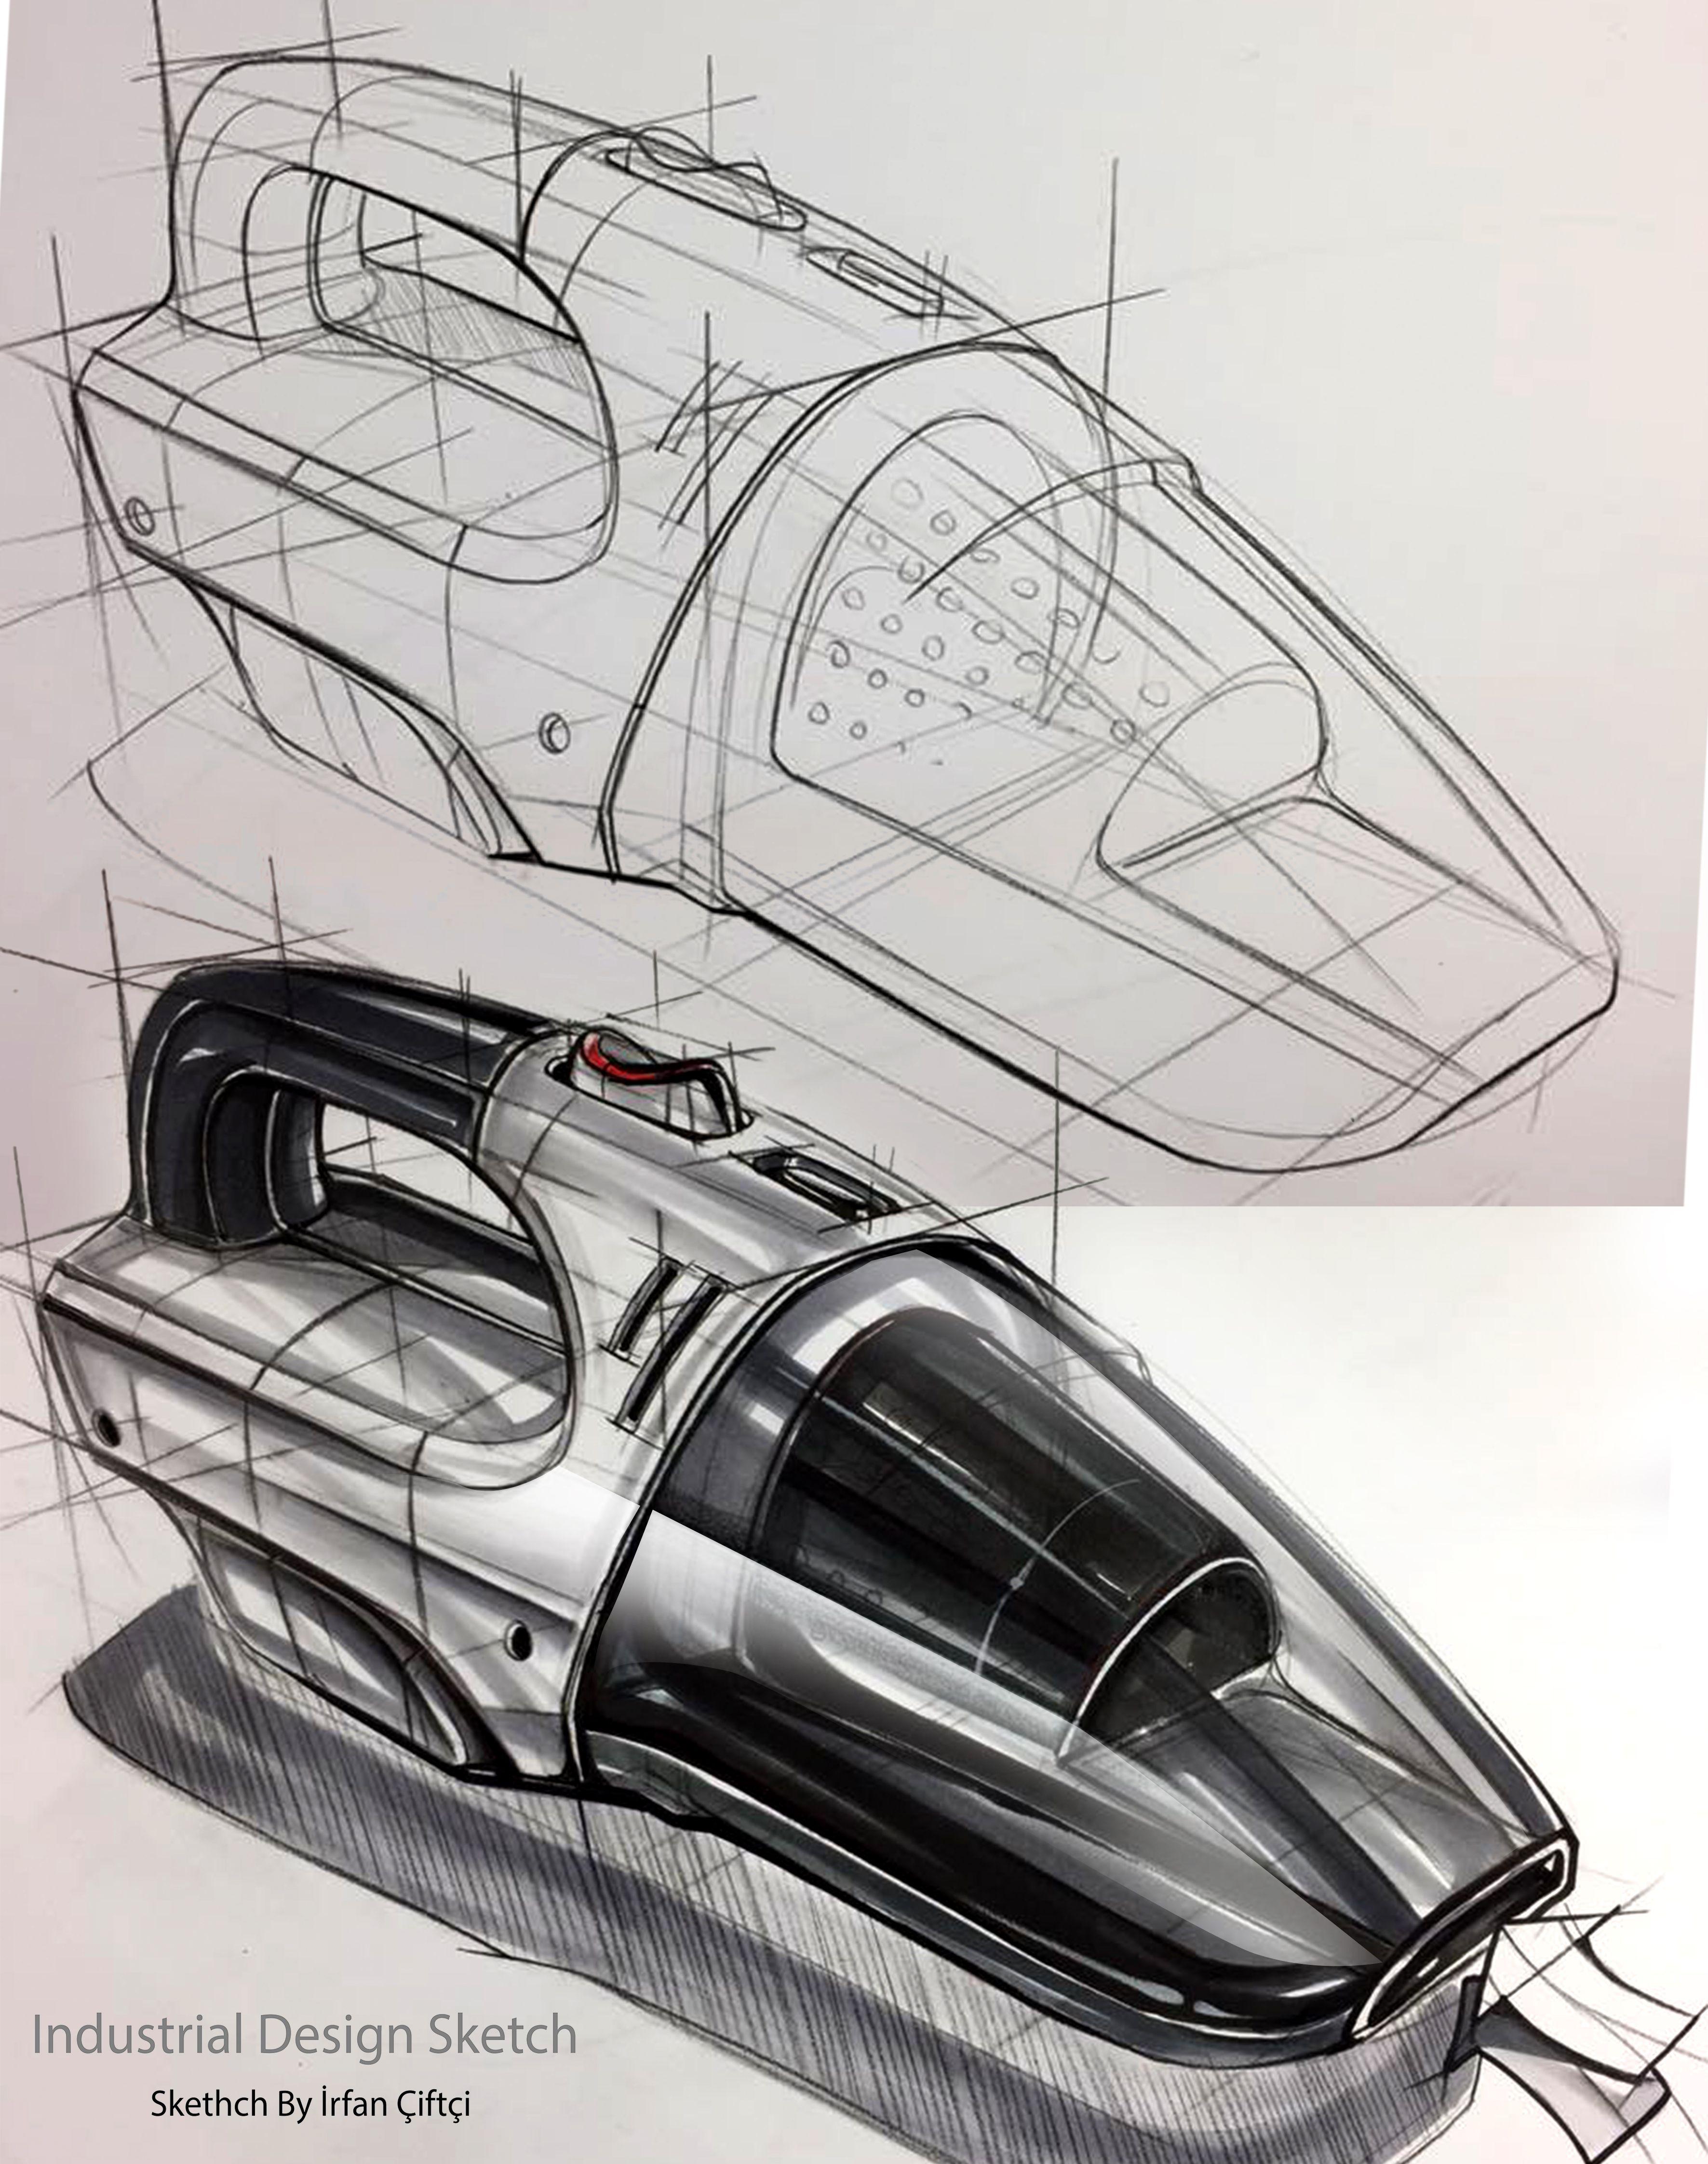 Sketching Markering Industrial Design Sketch Industrial Design Design Sketch Examples of bad industrial design